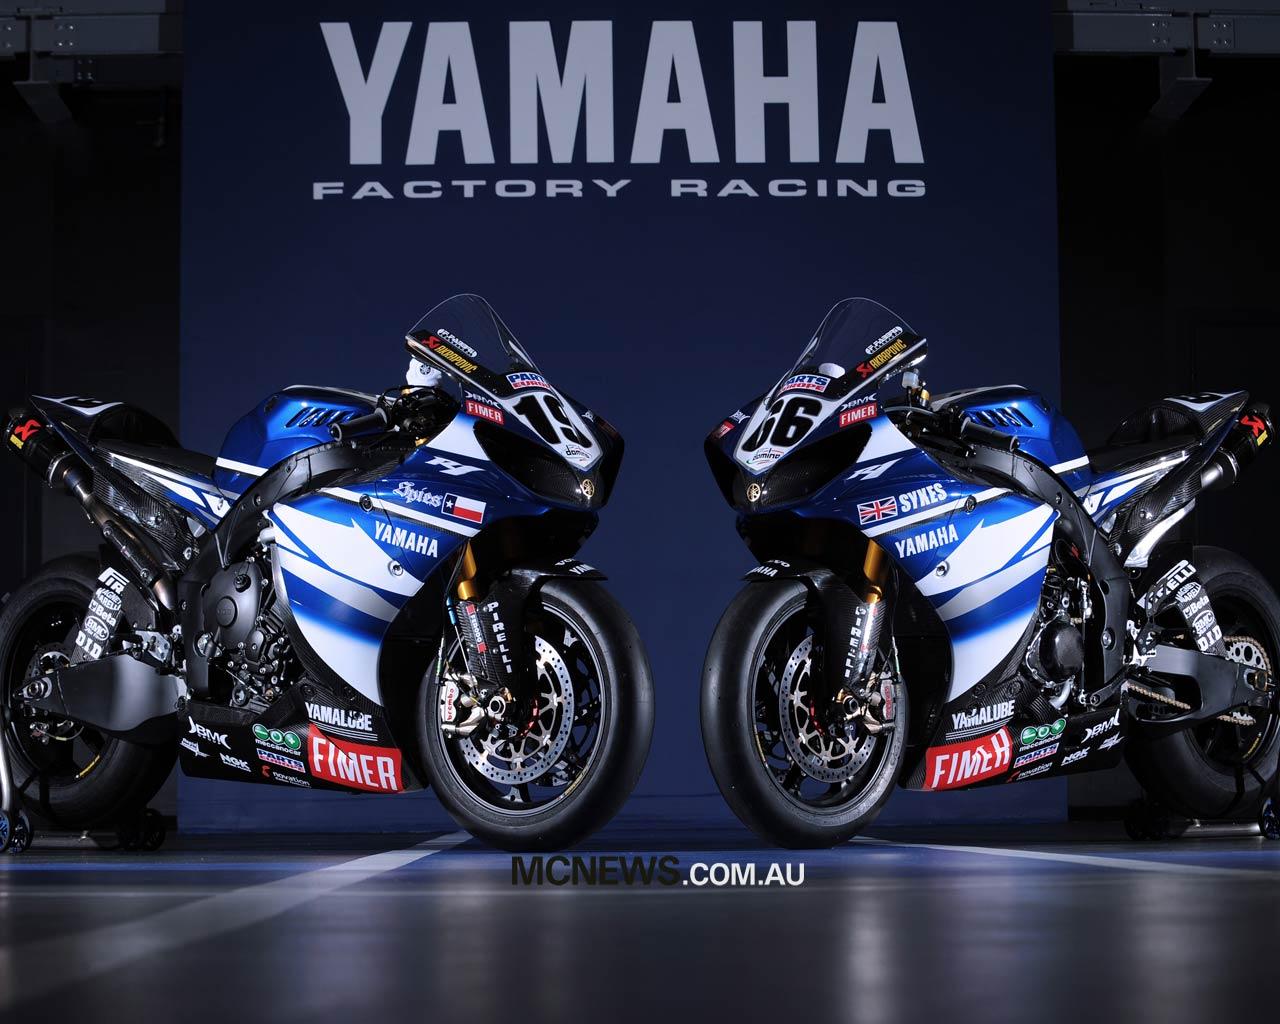 Download bikes wallpapers Yamaha R1 SuperBike Wallpapers 1280x1024